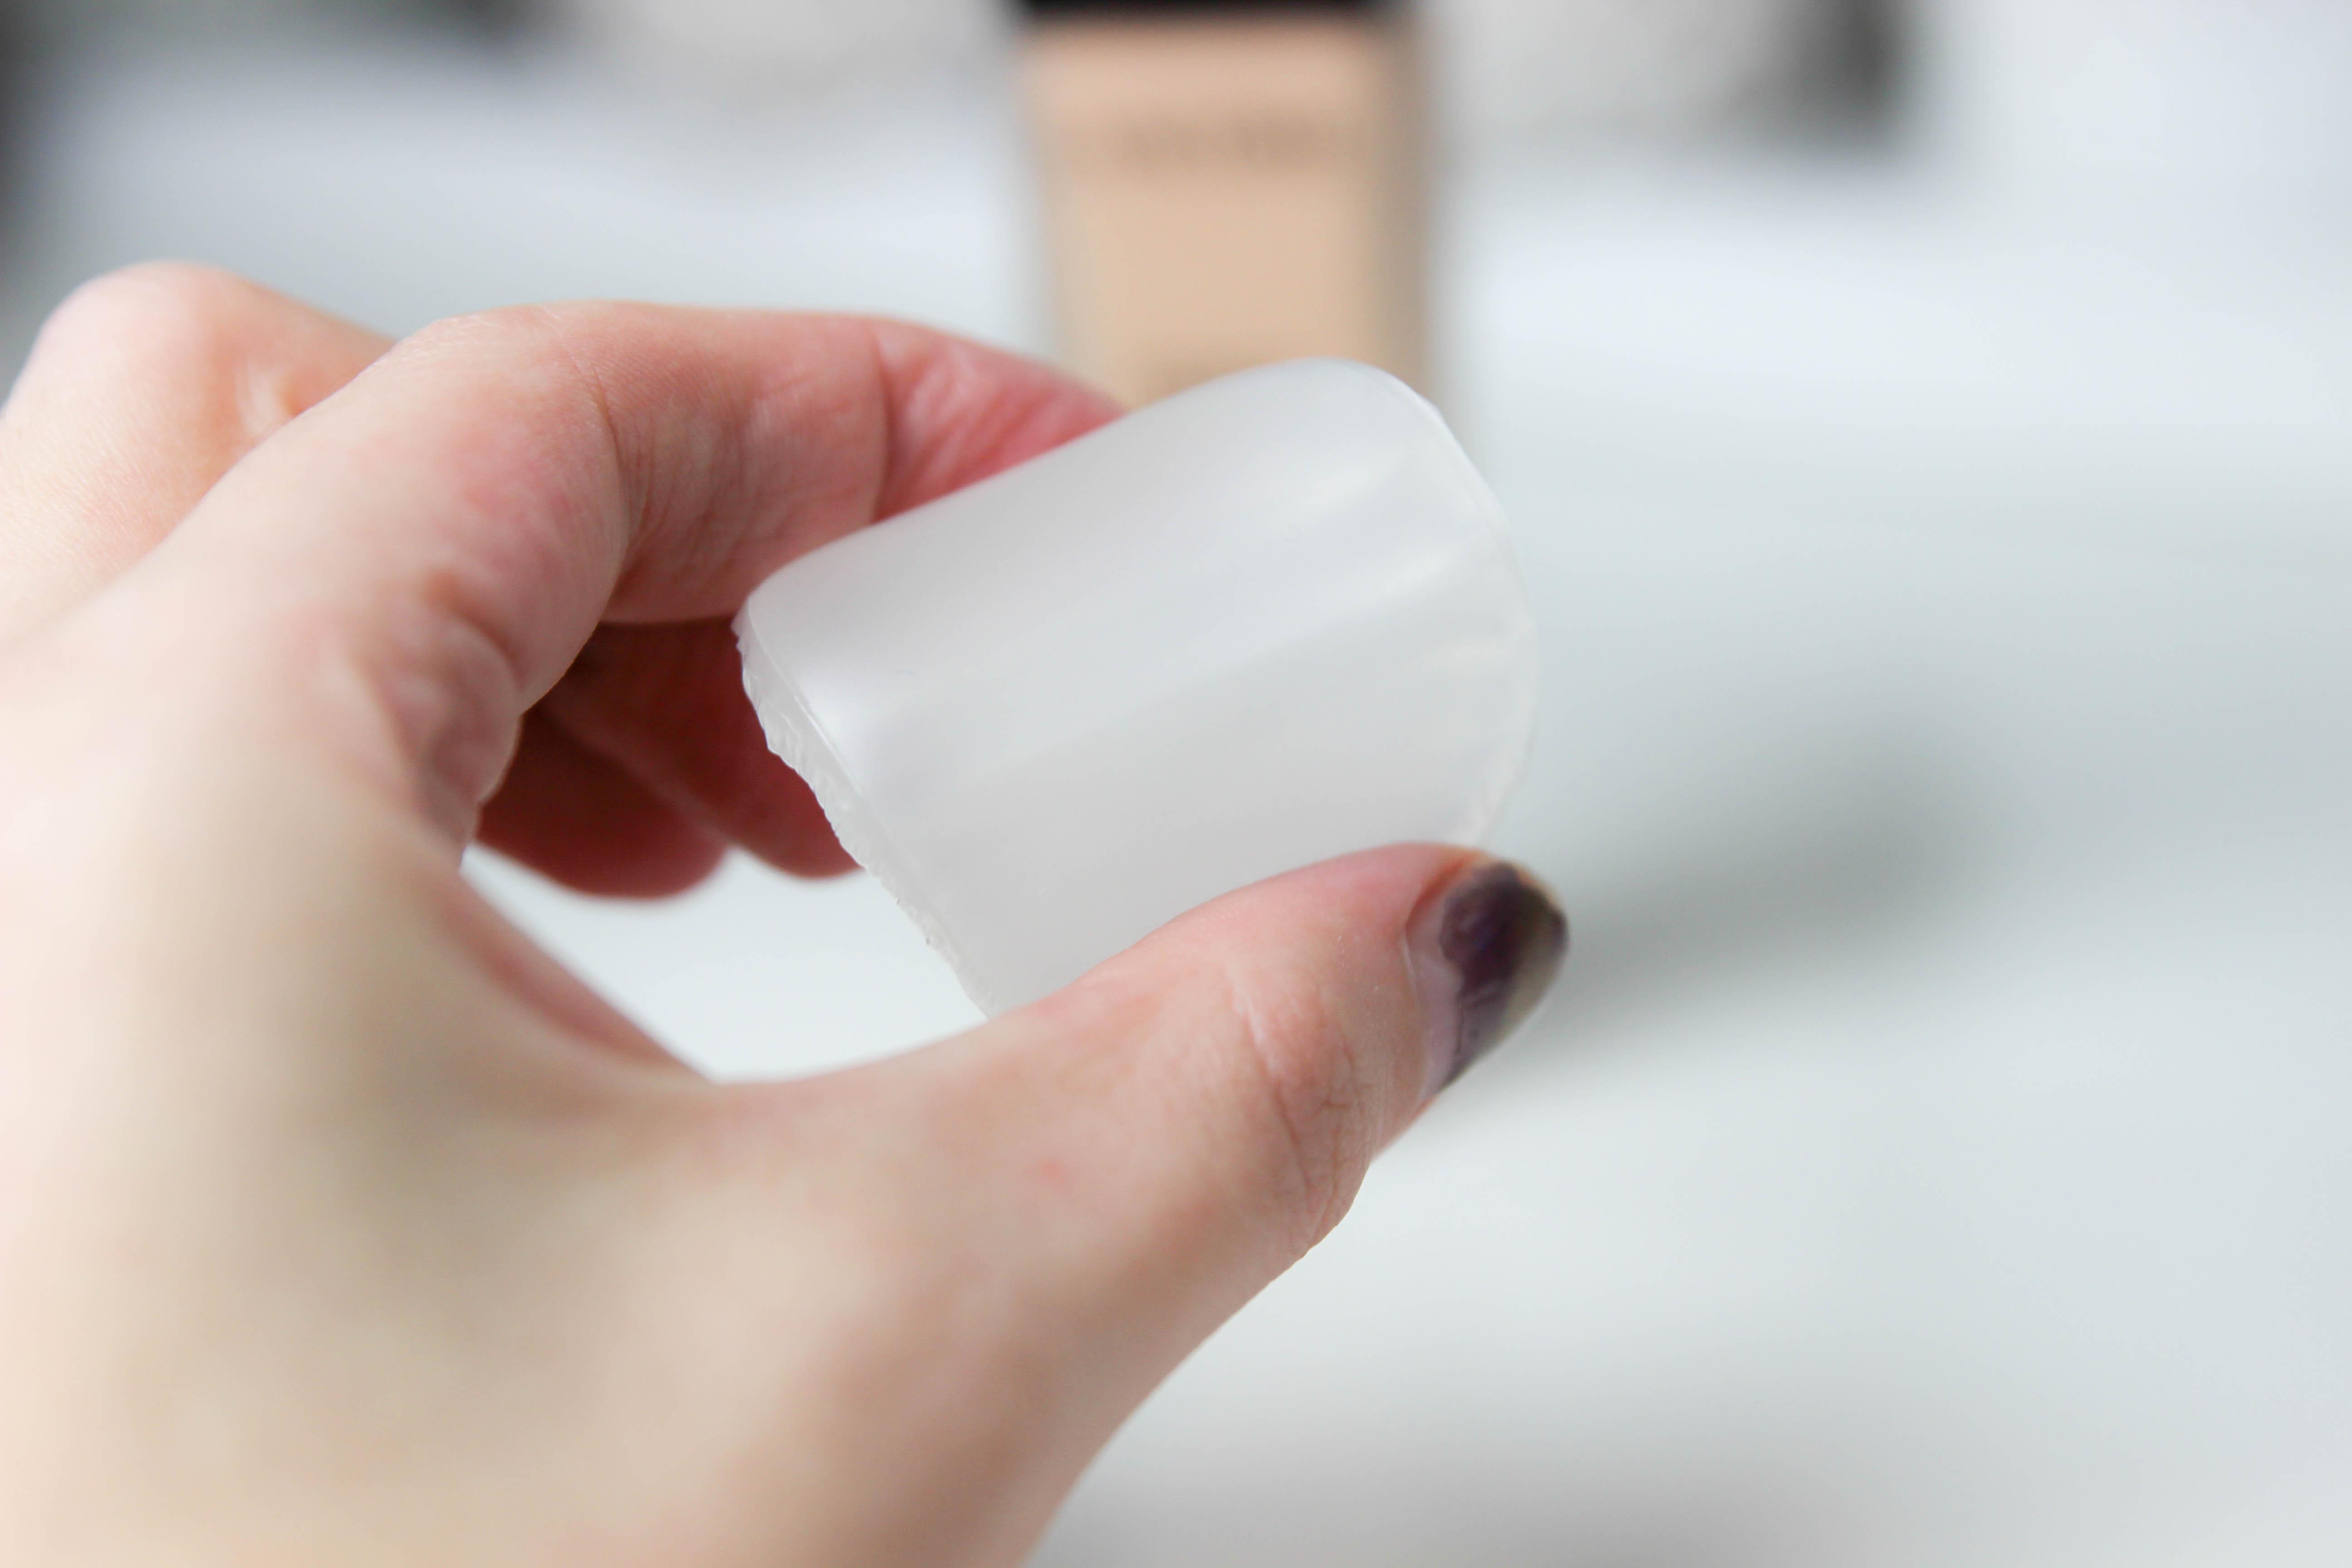 Eponge-silicone-silidrop-maquillage-5